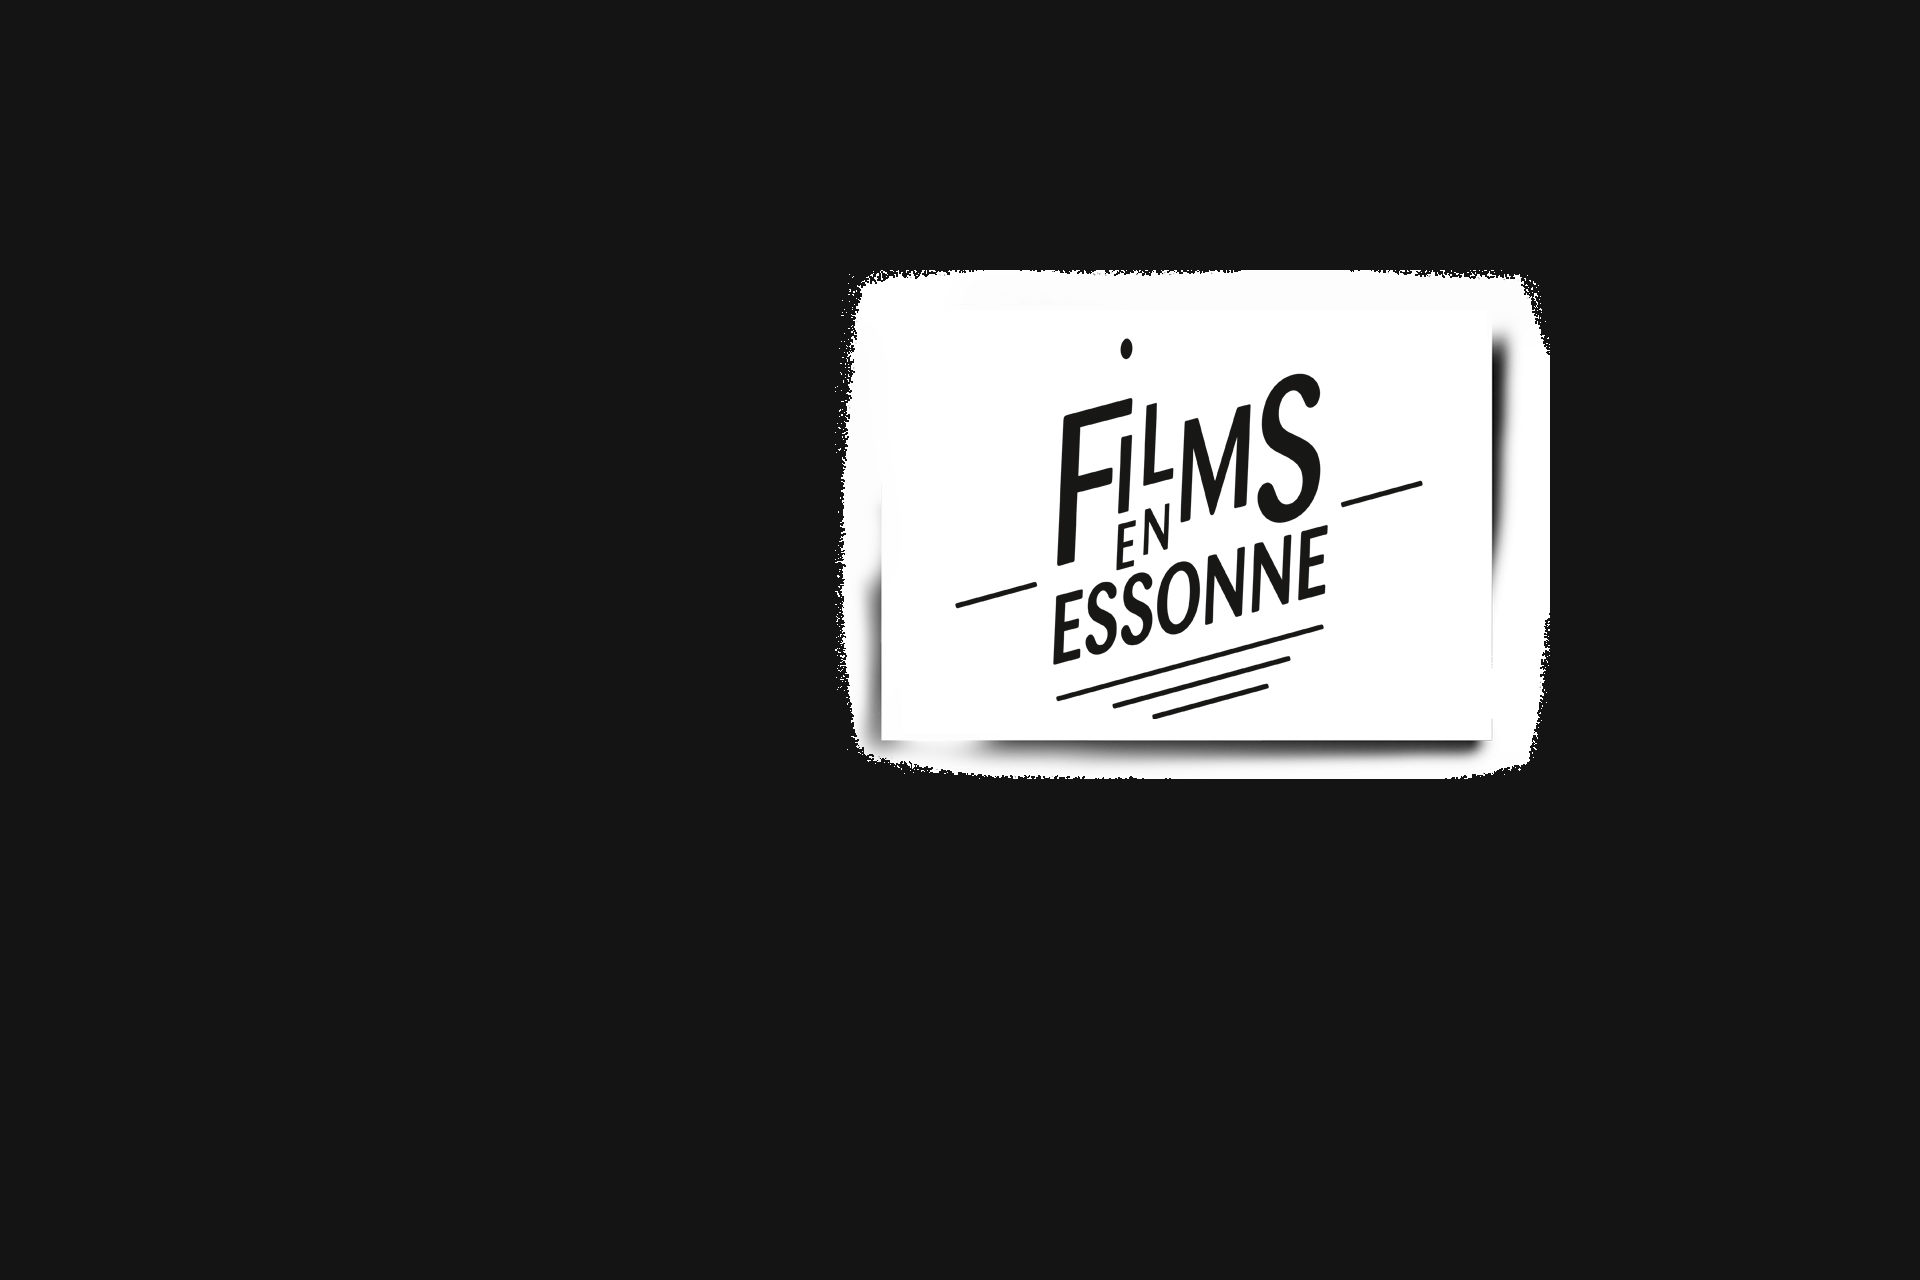 Film en Essonne